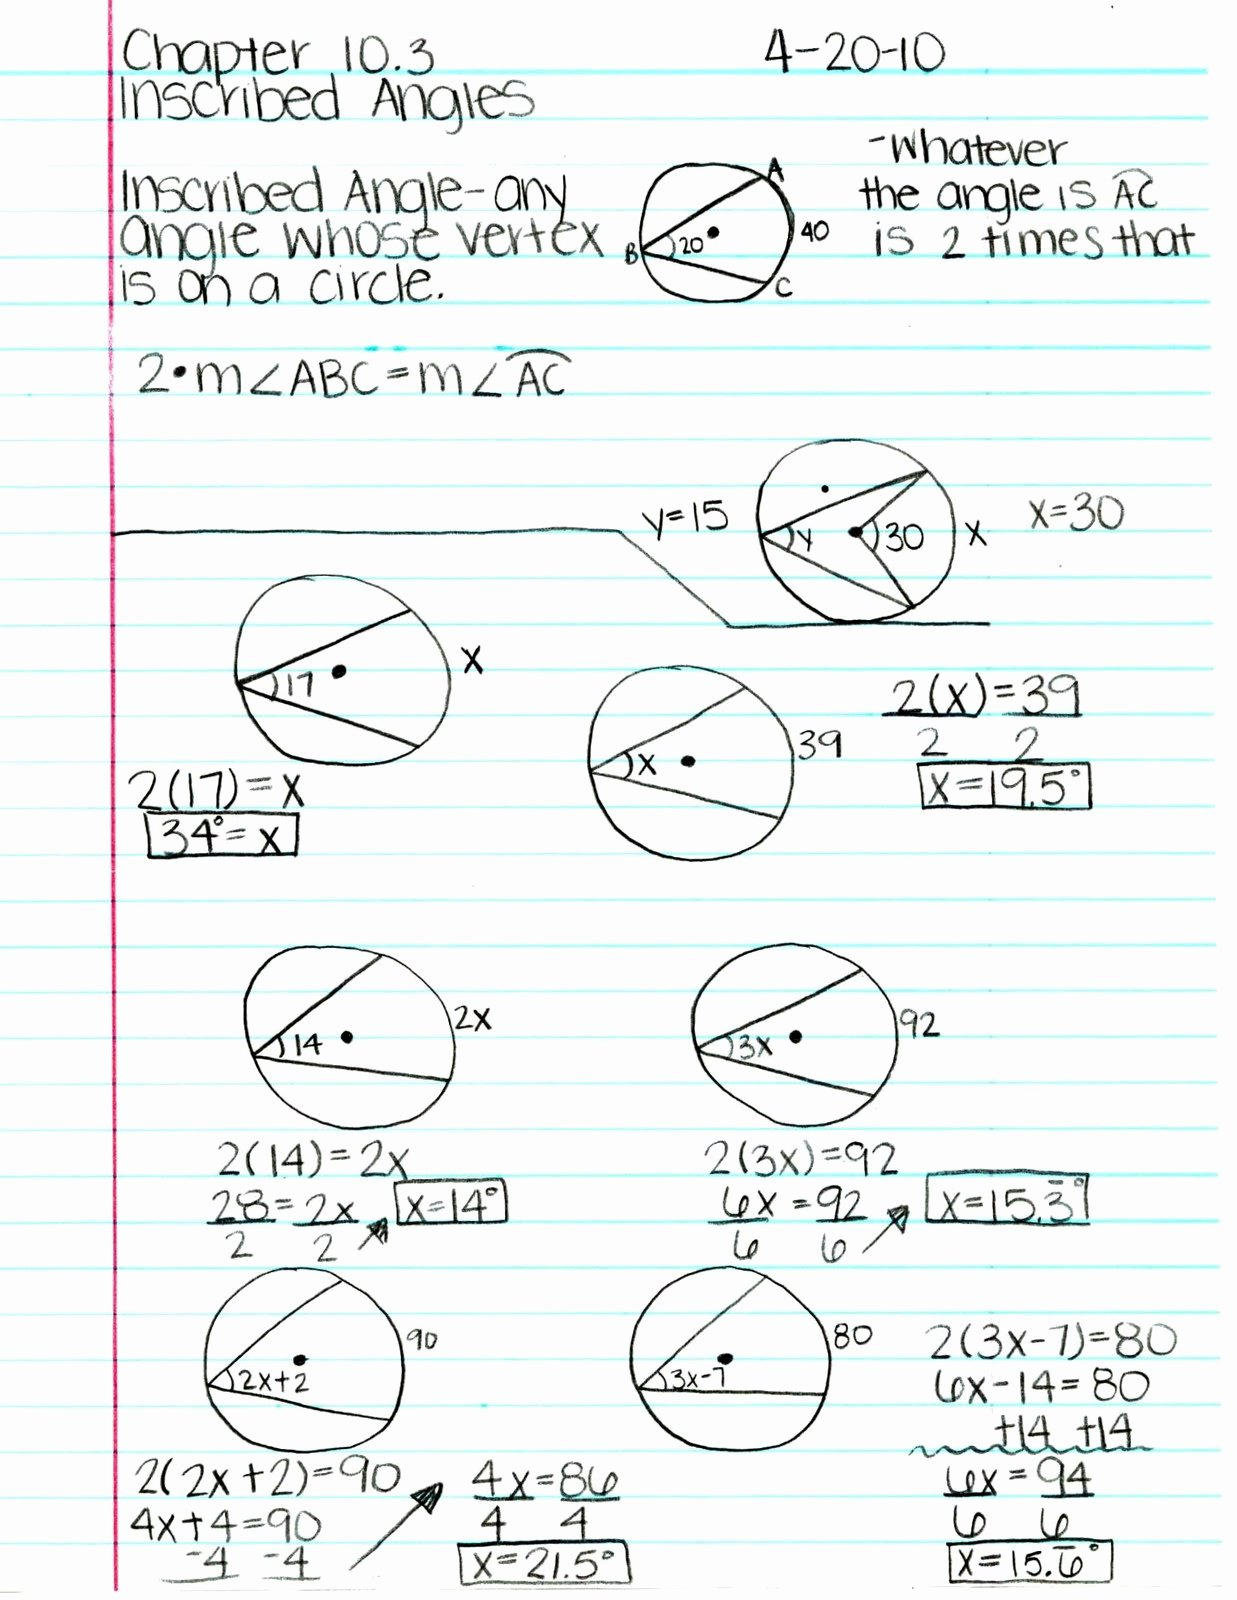 50 Angles In Circles Worksheet